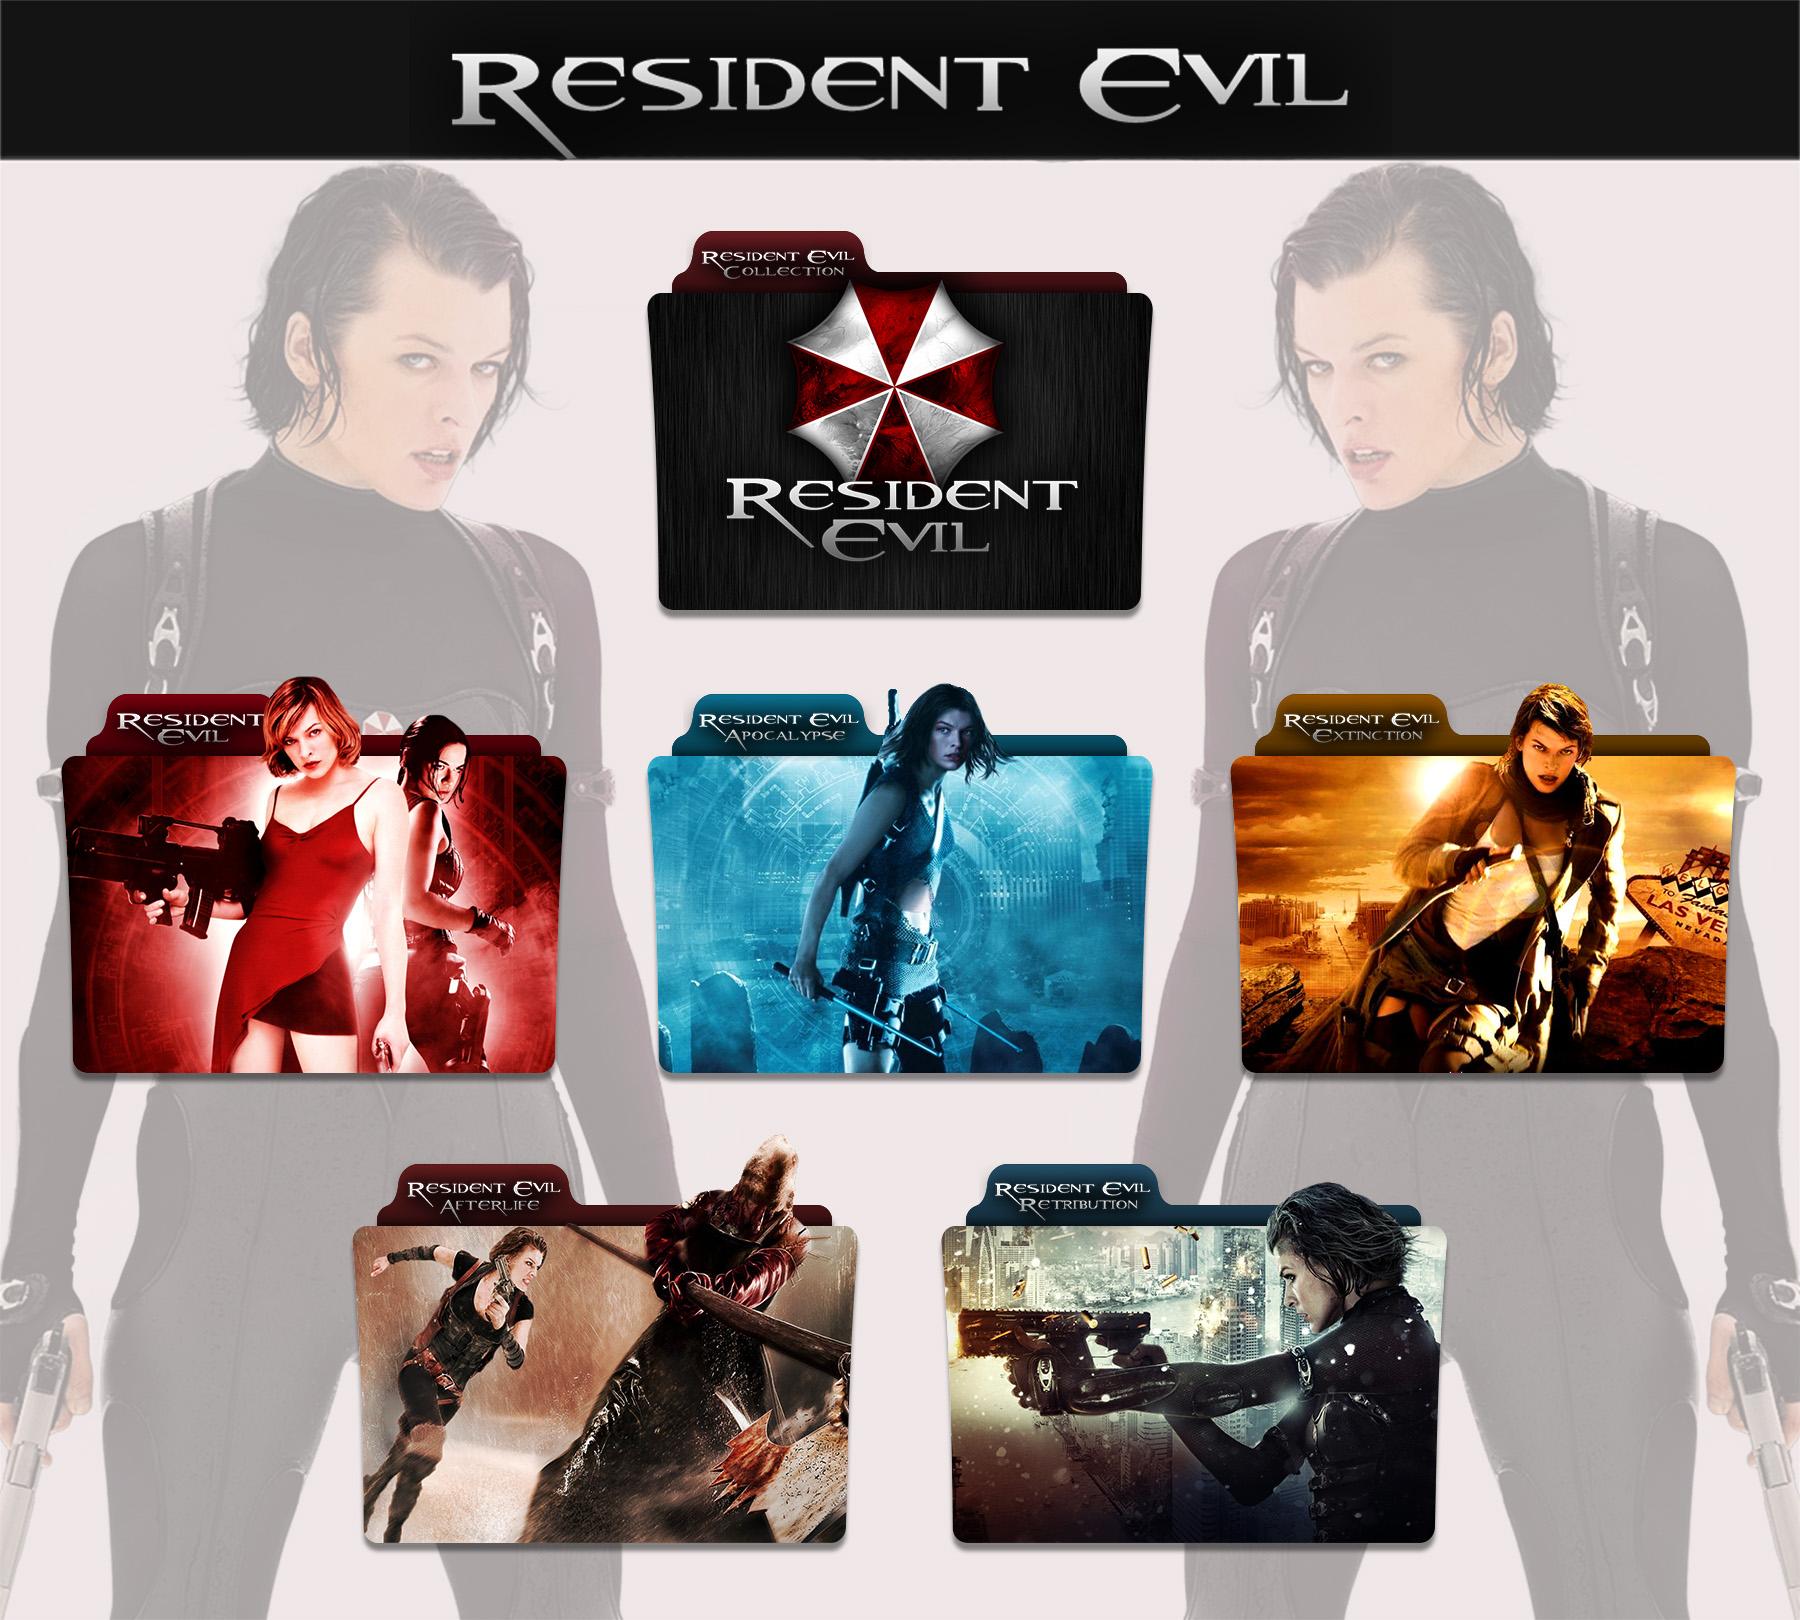 Resident evil retribution subtitle indonesia mp4.